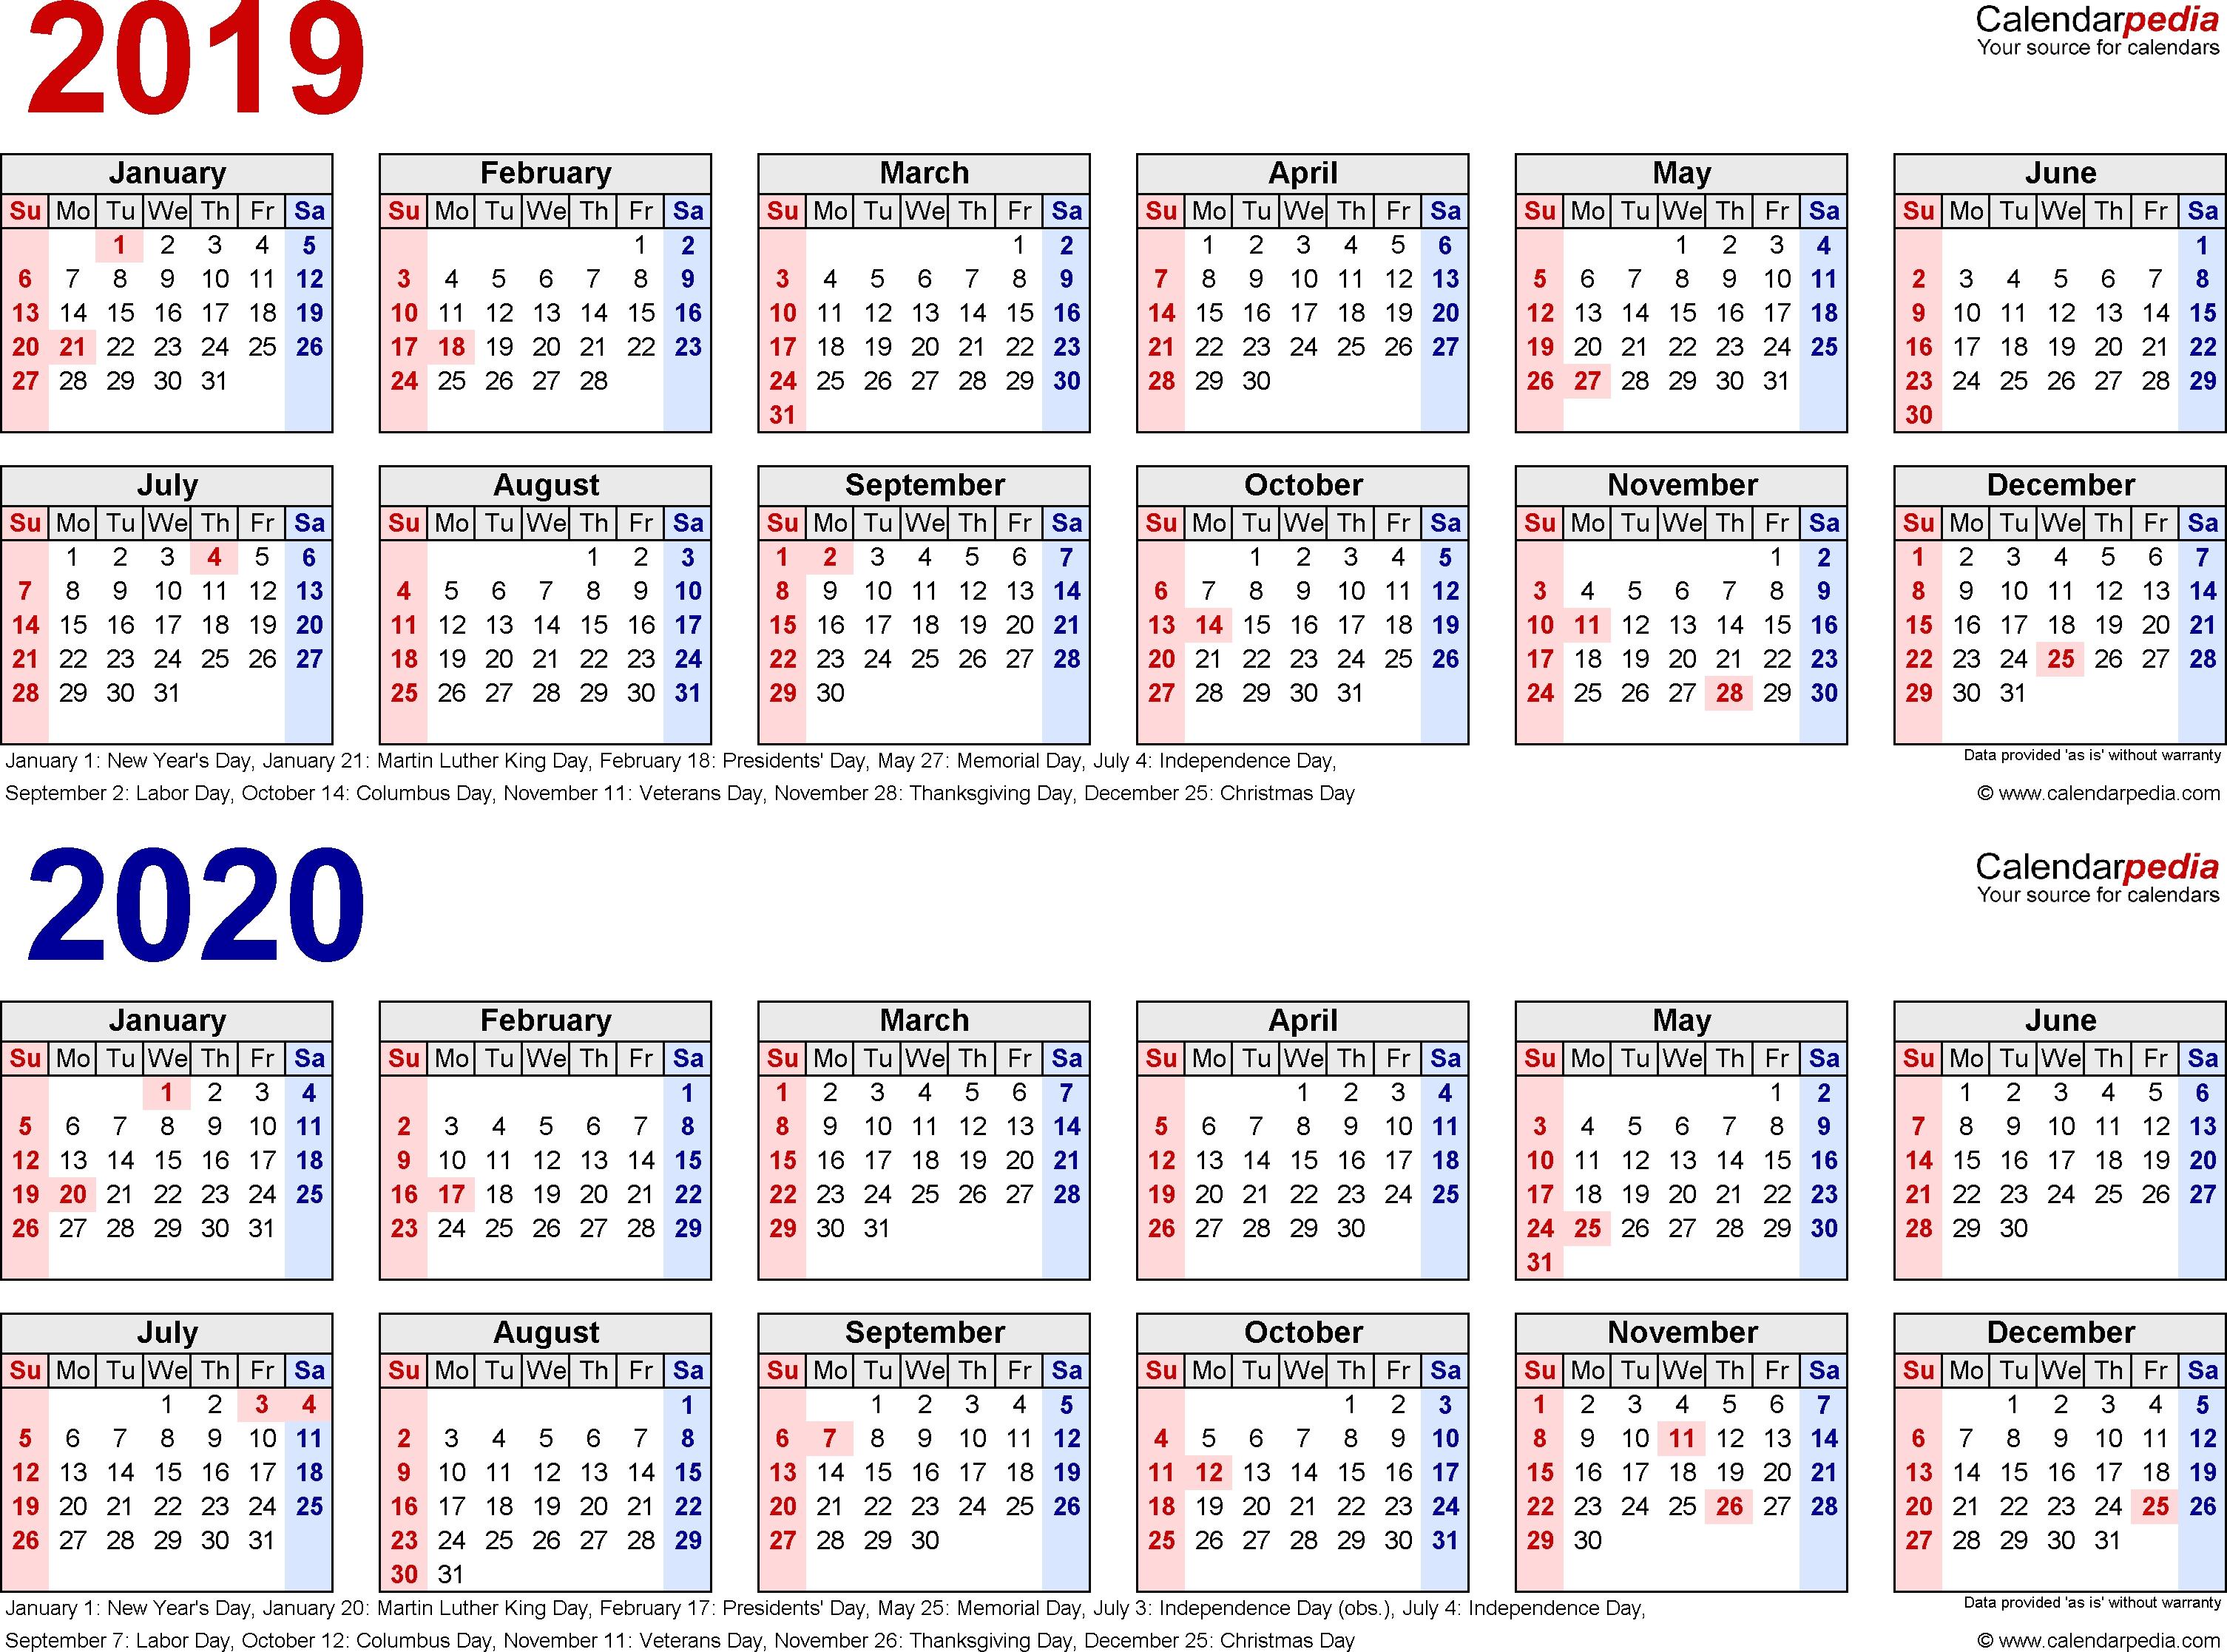 2019-2020 Two Year Calendar - Free Printable Microsoft Word inside 2019 2020 Financial Year Calendar